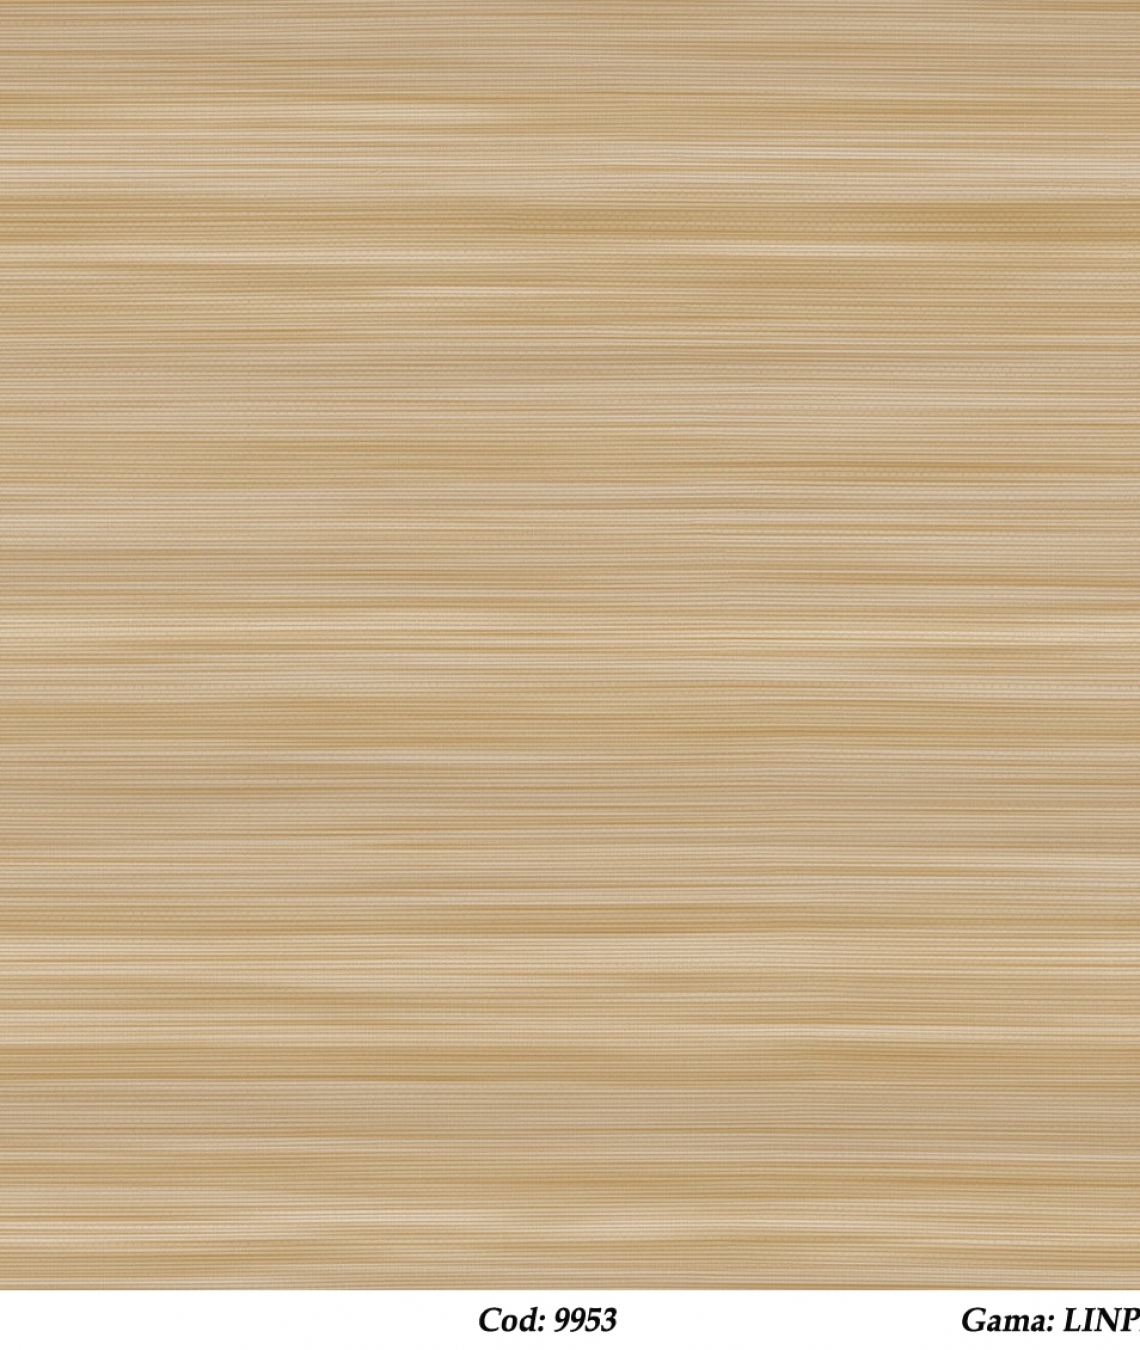 tapet-cu-dungi-orizontale-cod-9953-gama-linpha